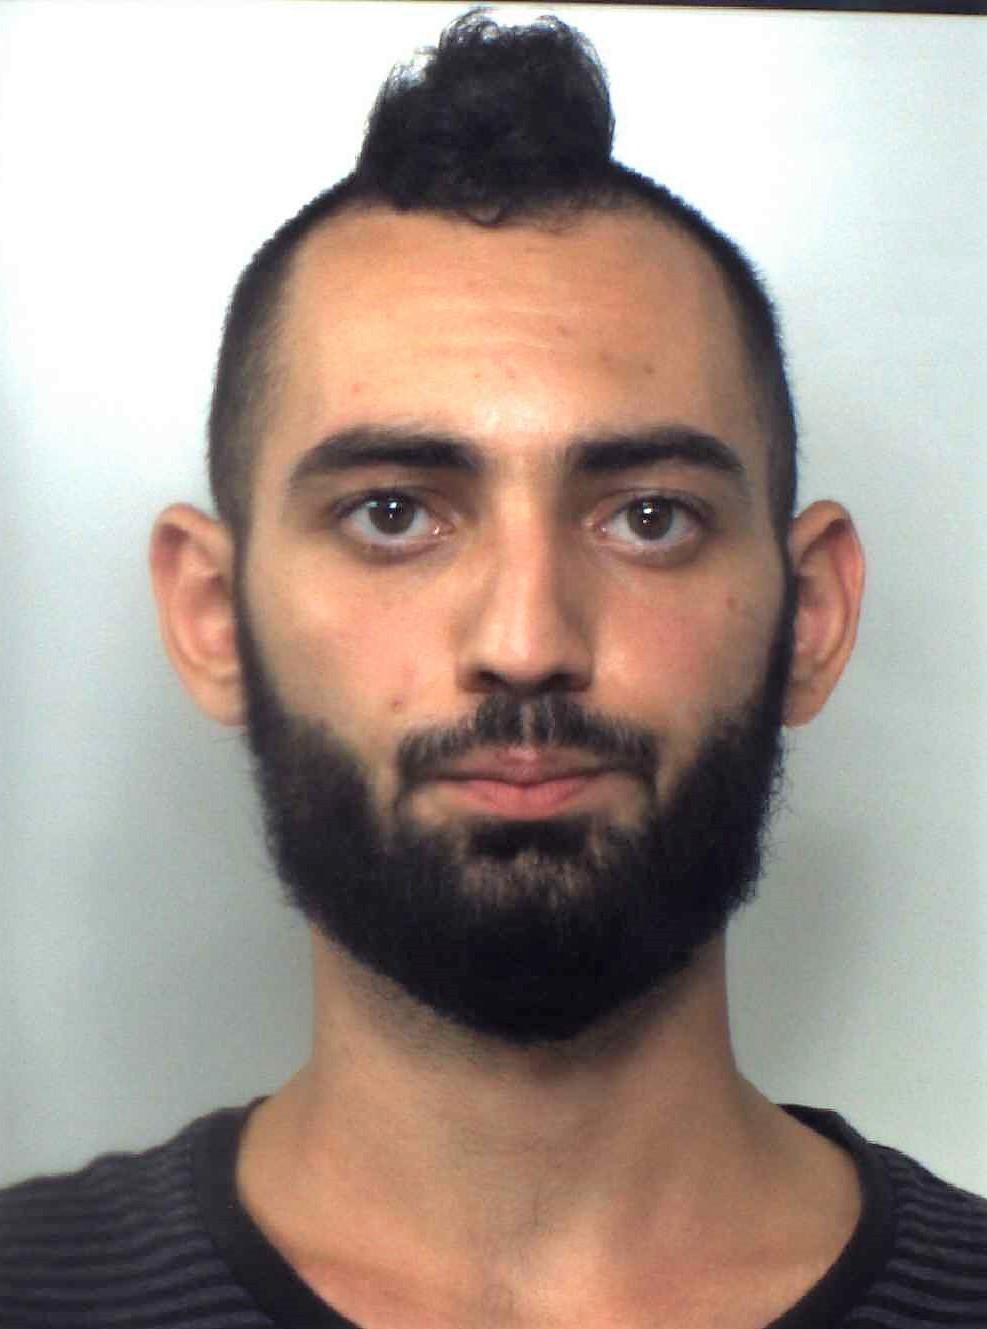 Spacciava marijuana ad Aci Castello: arrestato 22enne